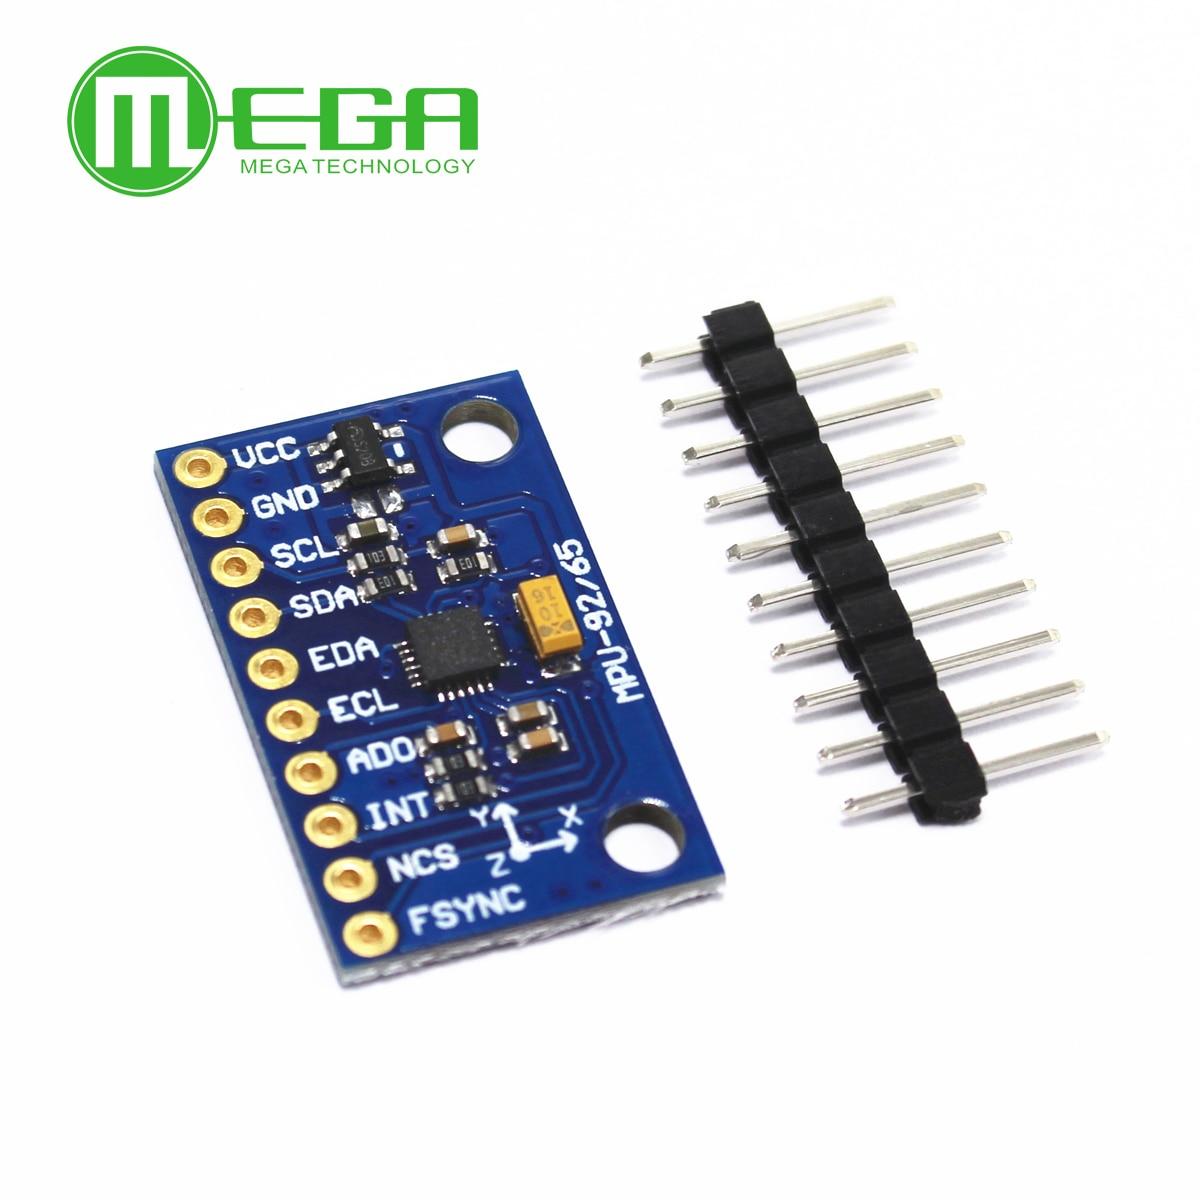 5pcs/lot MPU9255 MPU-9255 Sensor Module Three-axis Gyroscope Accelerometer Magnetic Field GY-9255